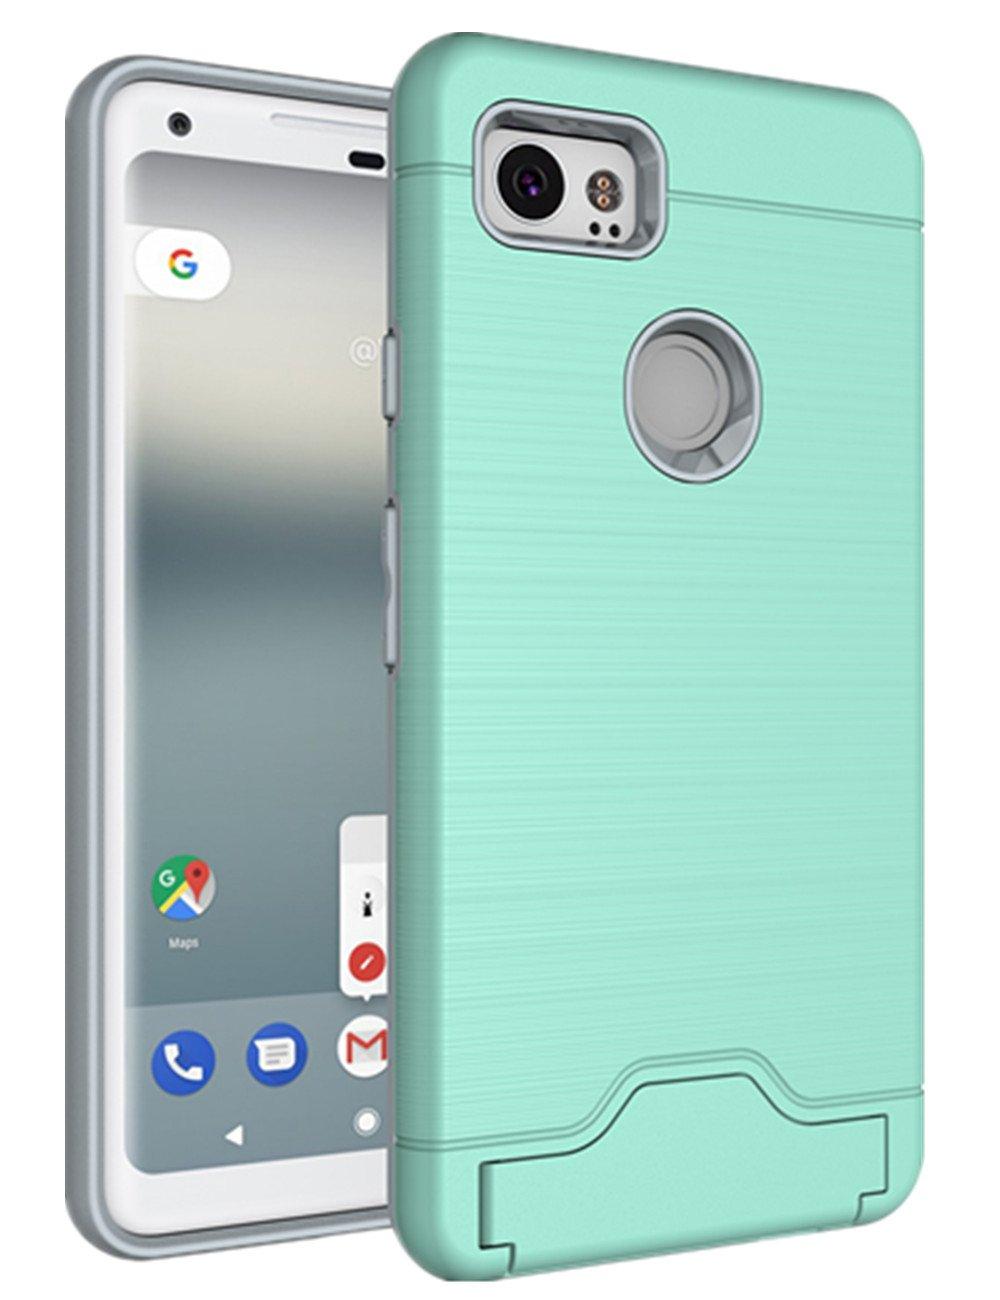 Google Pixel 2 Case, KAMII [Card Slot Holder] Shockproof Slim Fit Dual Layer Hybrid Wallet Case Protective Hard Cover Skin Card Holder with Built-in Kickstand for Google Pixel 2 (2017) (Aqua) by KAMII (Image #1)